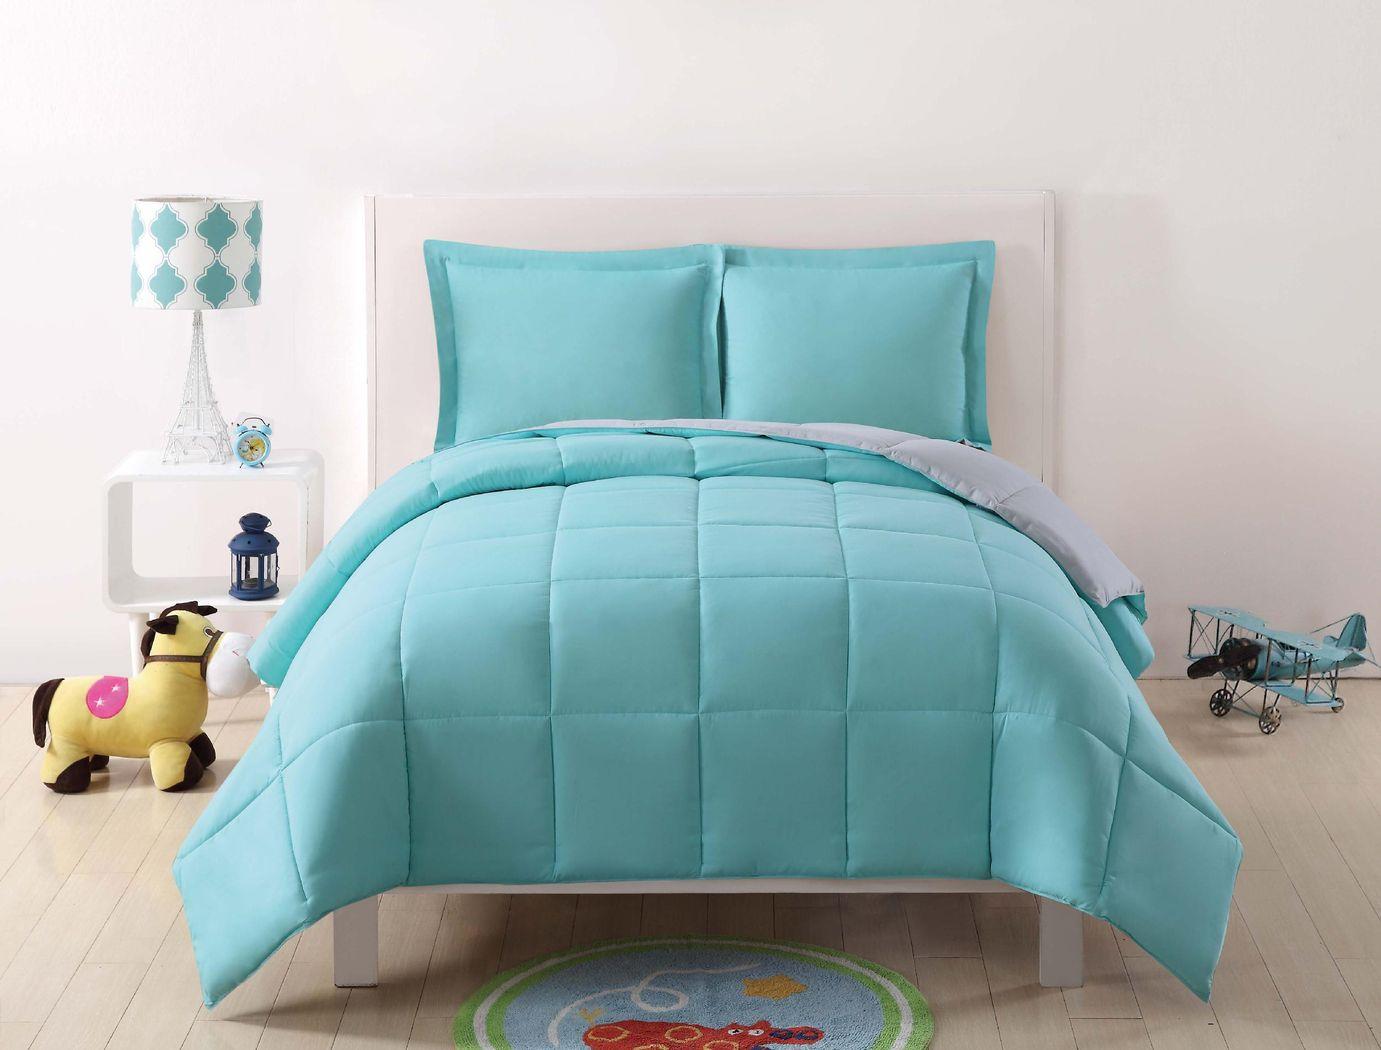 Kids Boyette Turquoise/Gray 2 Pc Twin Comforter Set